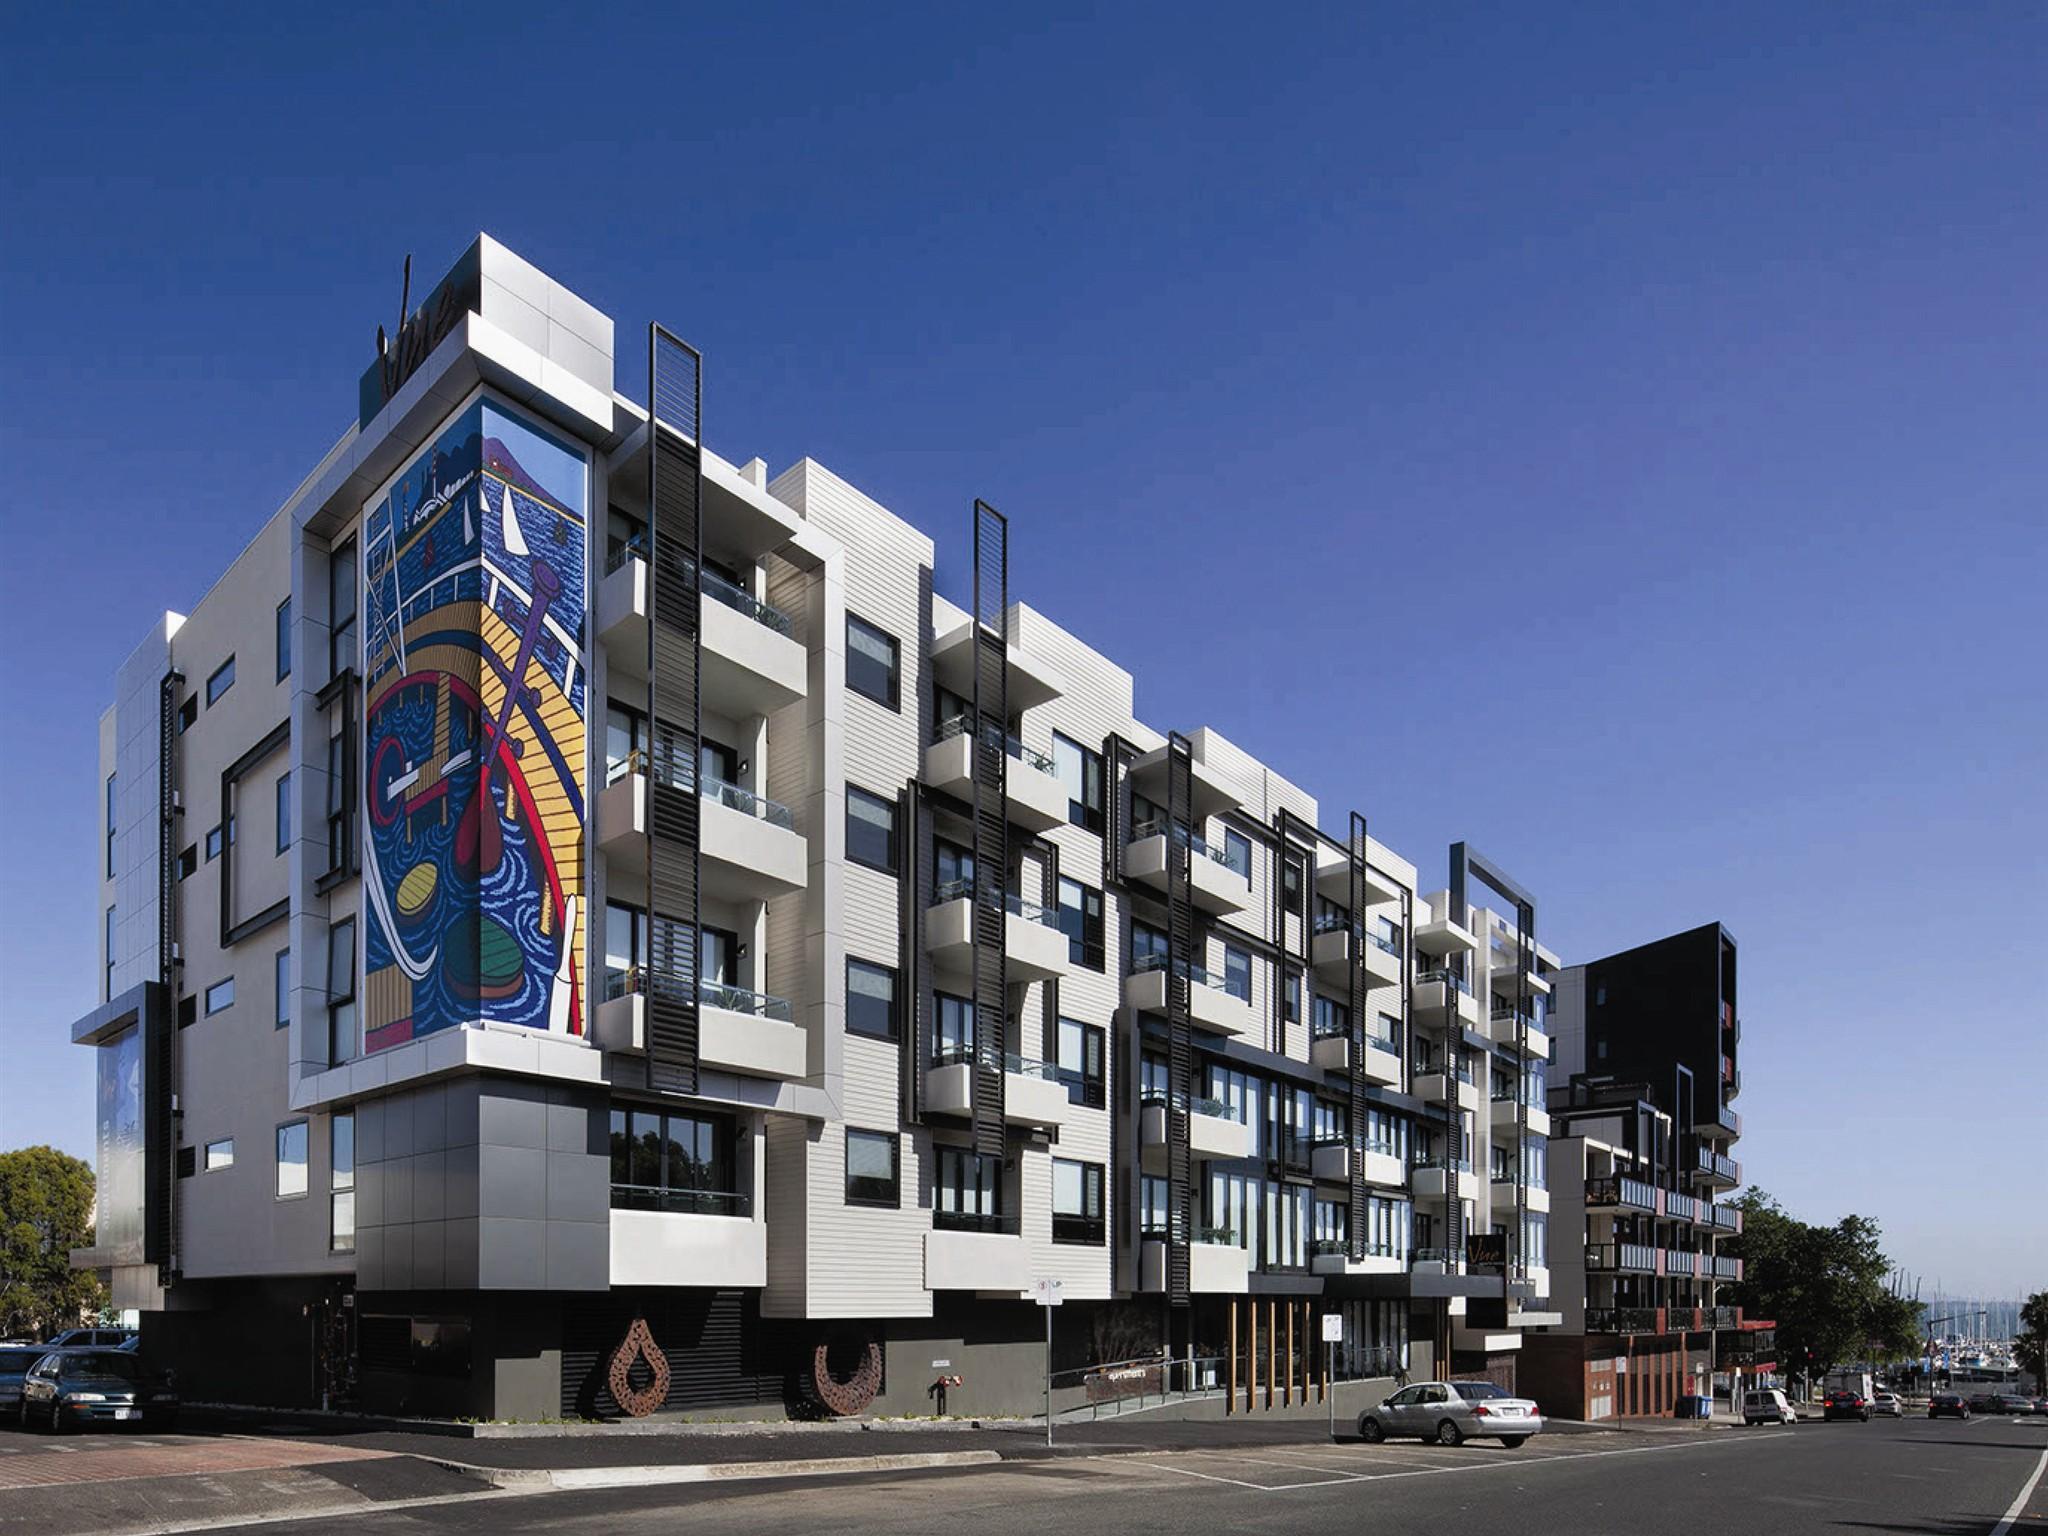 Vue Apartments, Geelong